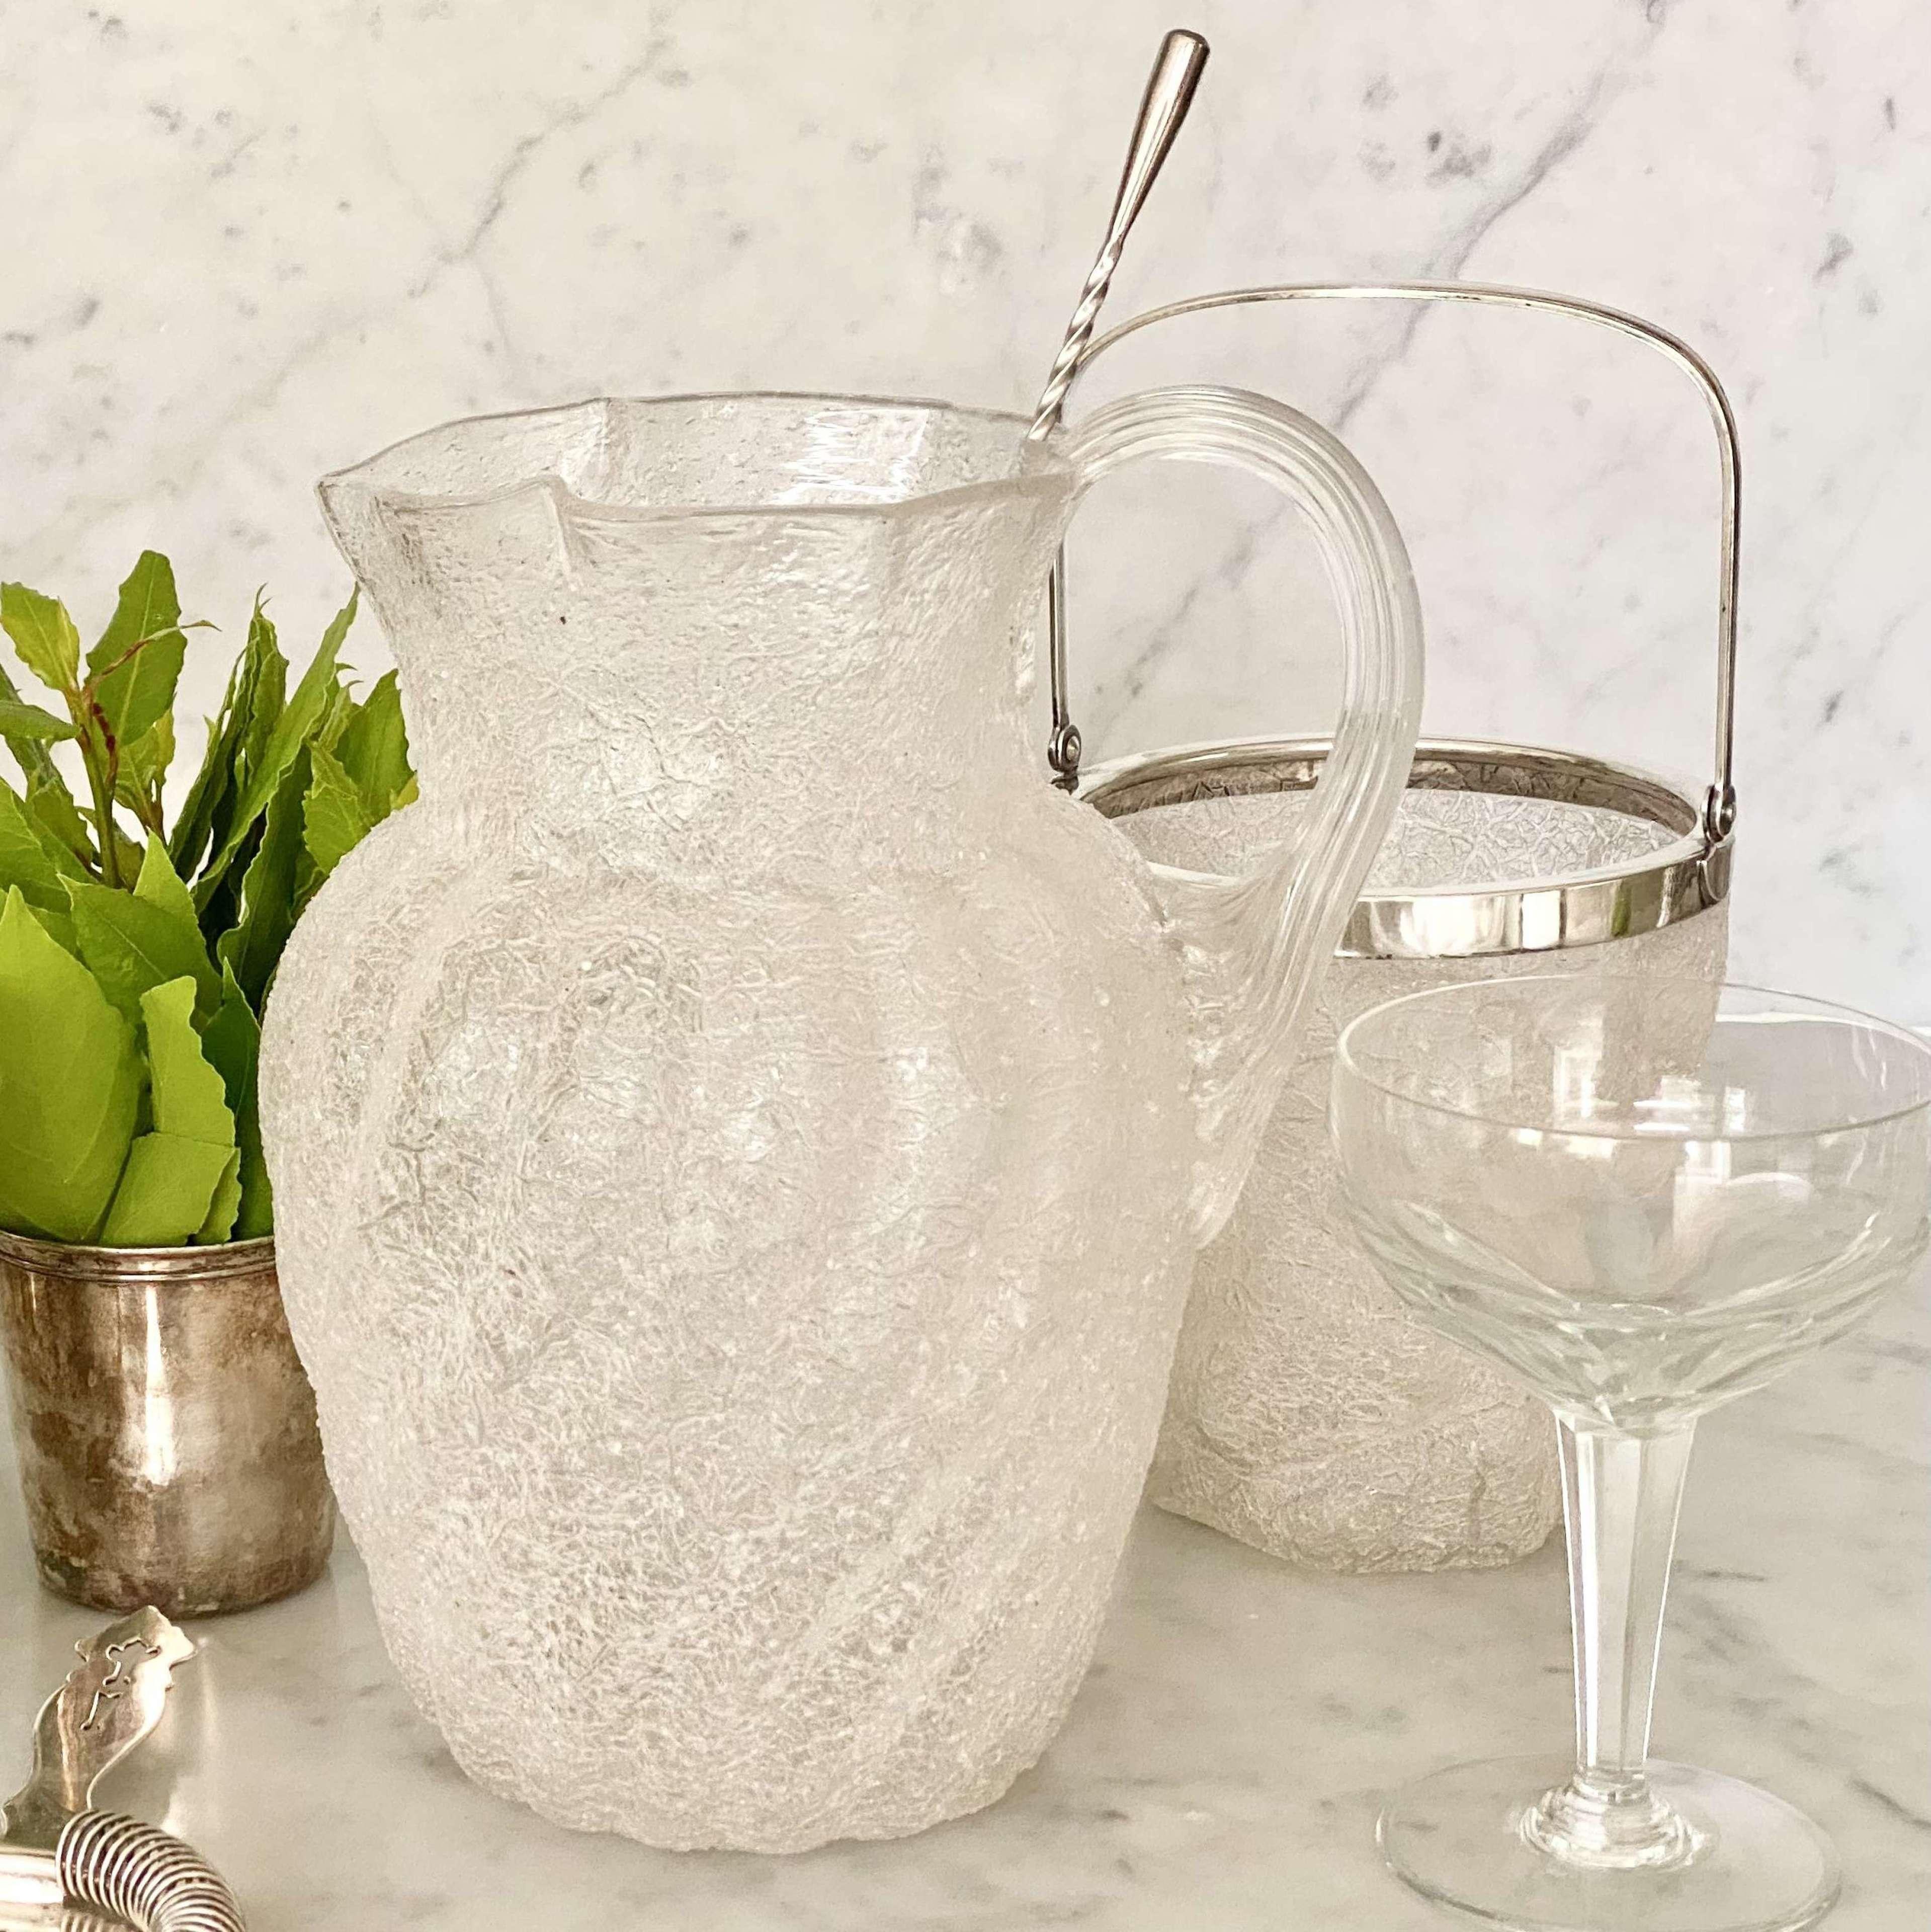 WMF iceberg glass & silver plated ice bucket & jug